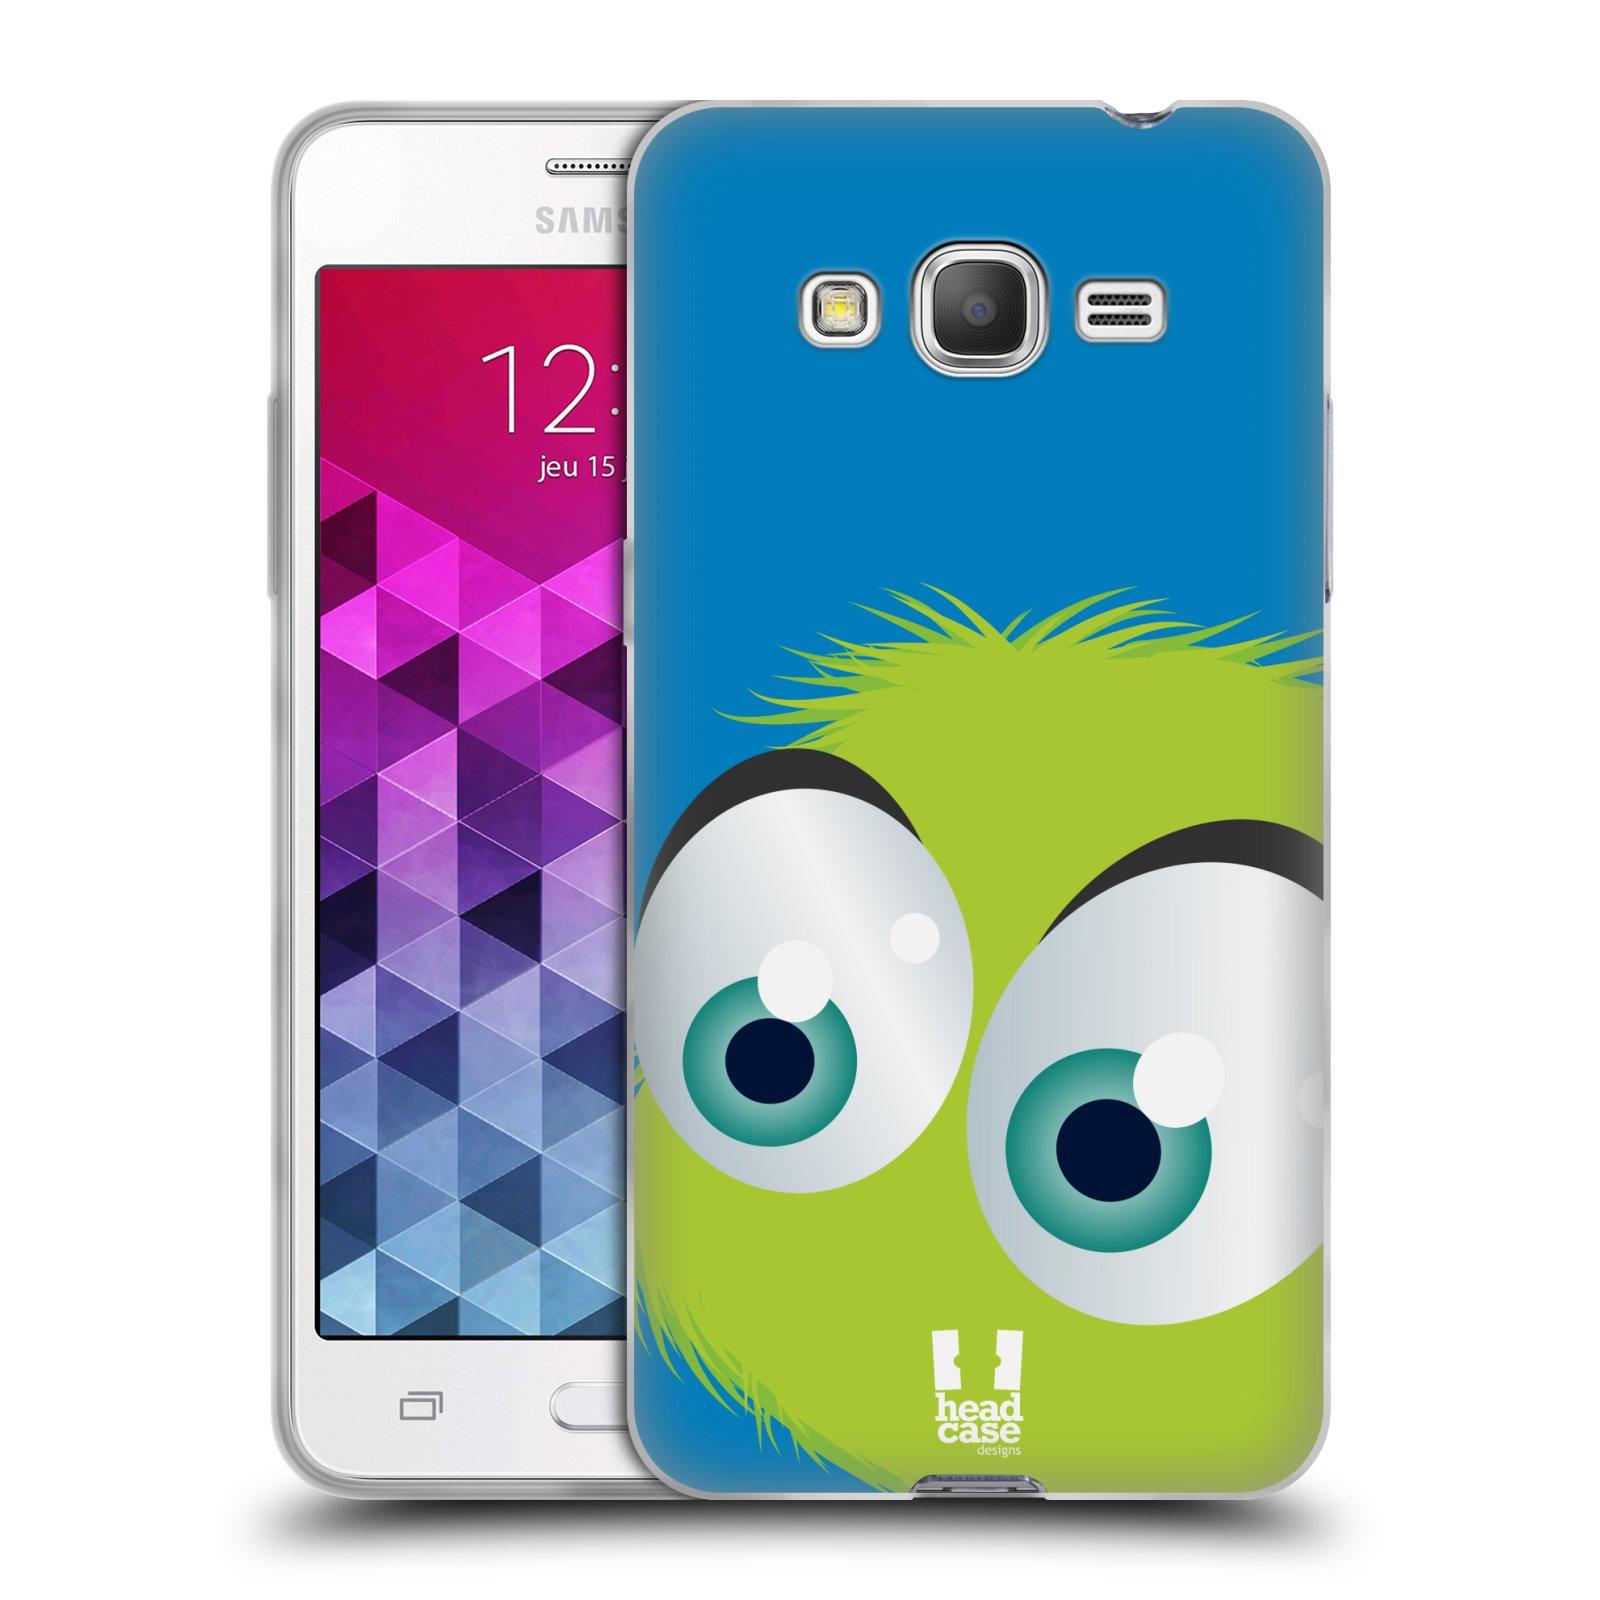 Silikonové pouzdro na mobil Samsung Galaxy Grand Prime VE HEAD CASE FUZÍK ZELENÝ (Silikonový kryt či obal na mobilní telefon Samsung Galaxy Grand Prime VE SM-G531F)